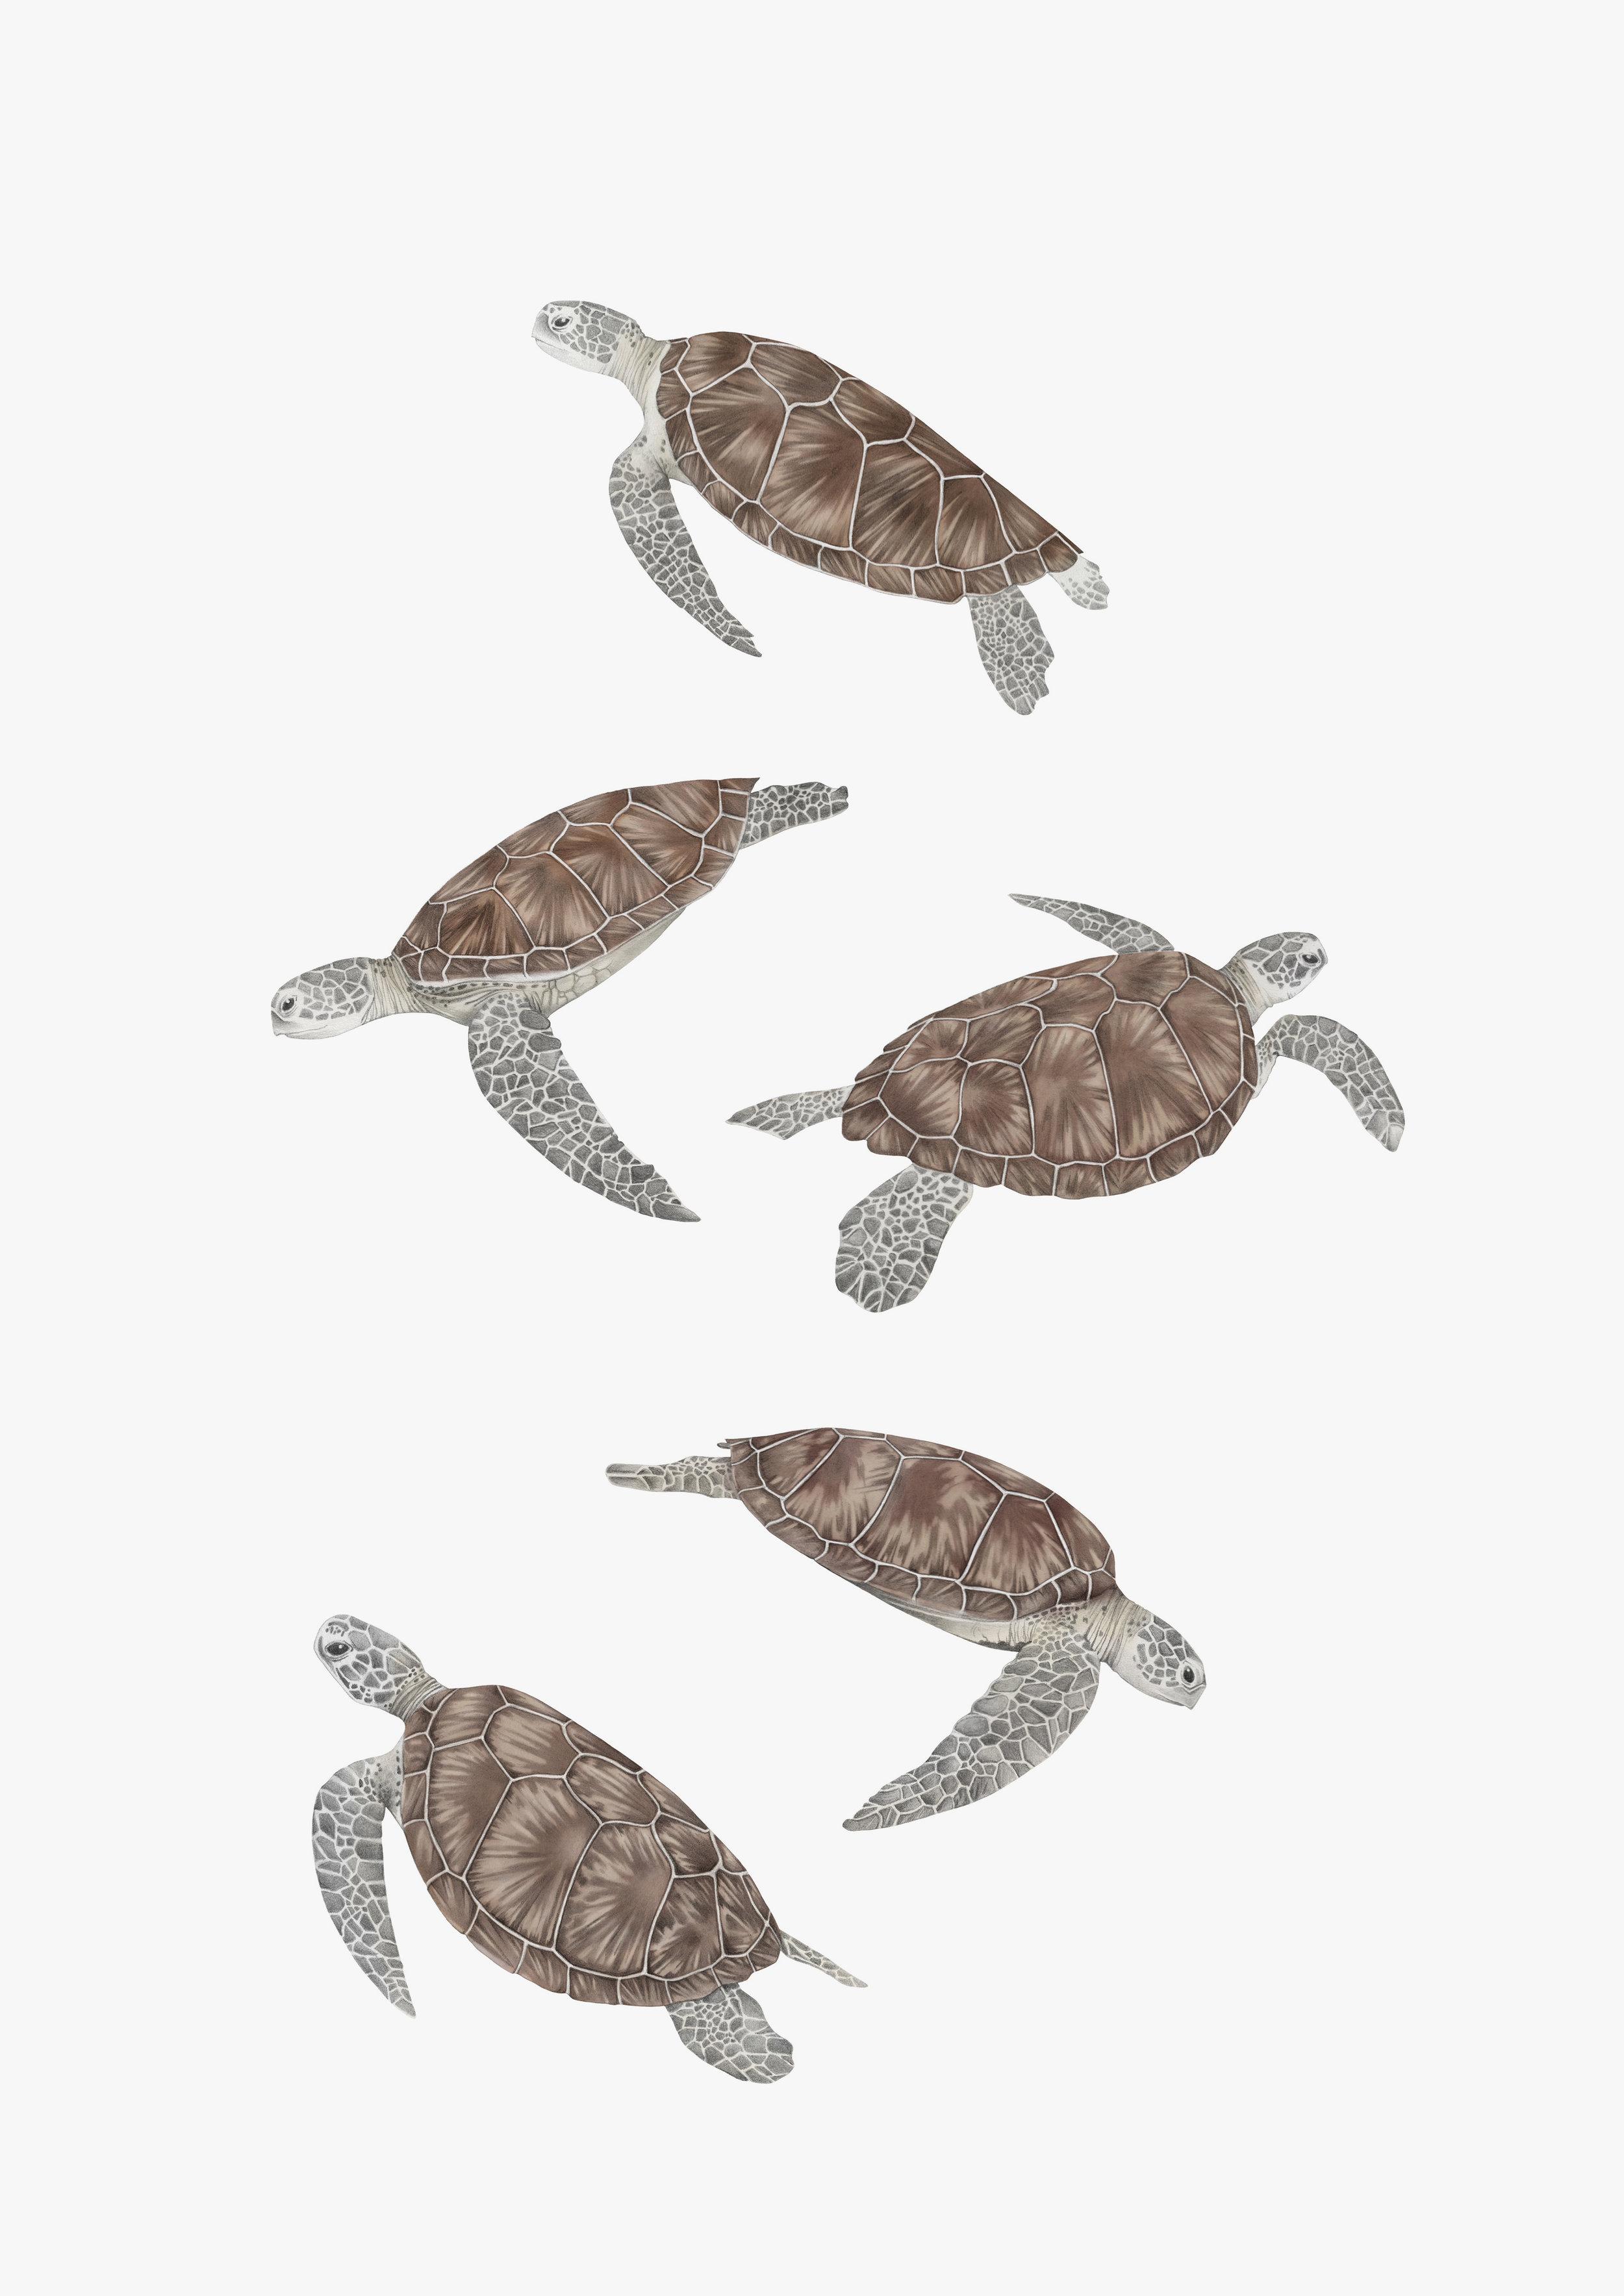 turtles rgb grey back.jpg